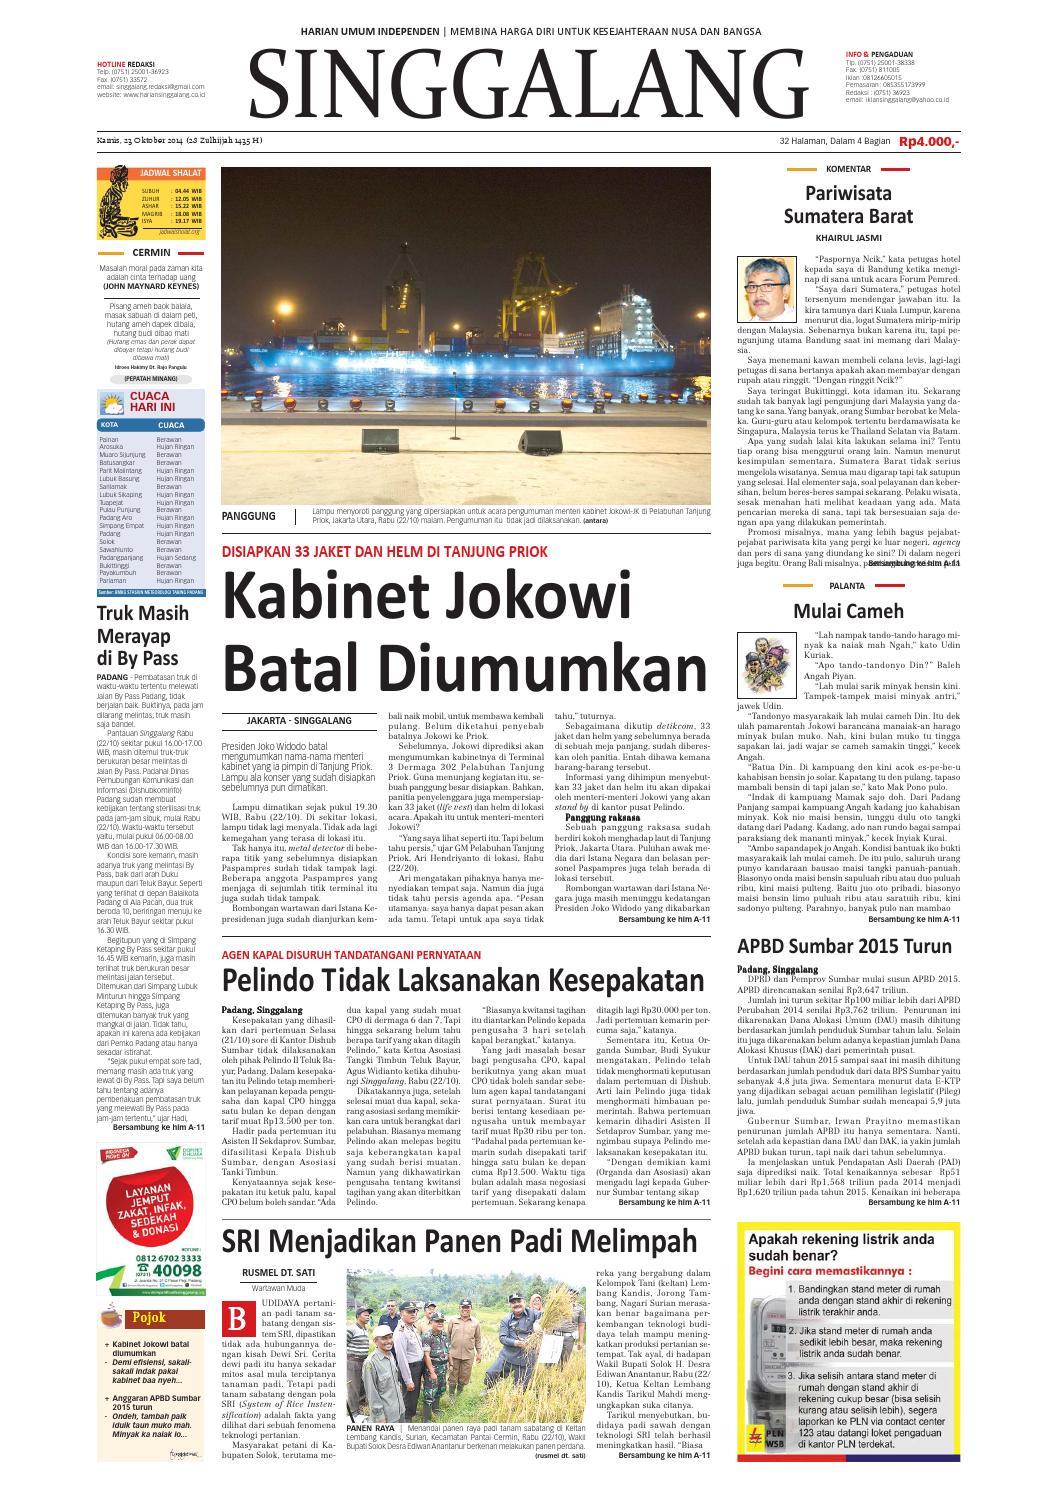 Harian Singgalang Kamis 23 Oktober 2014 By Issuu Produk Ukm Bumn Tenun Pagatan Kemeja Pria Biru Kapal